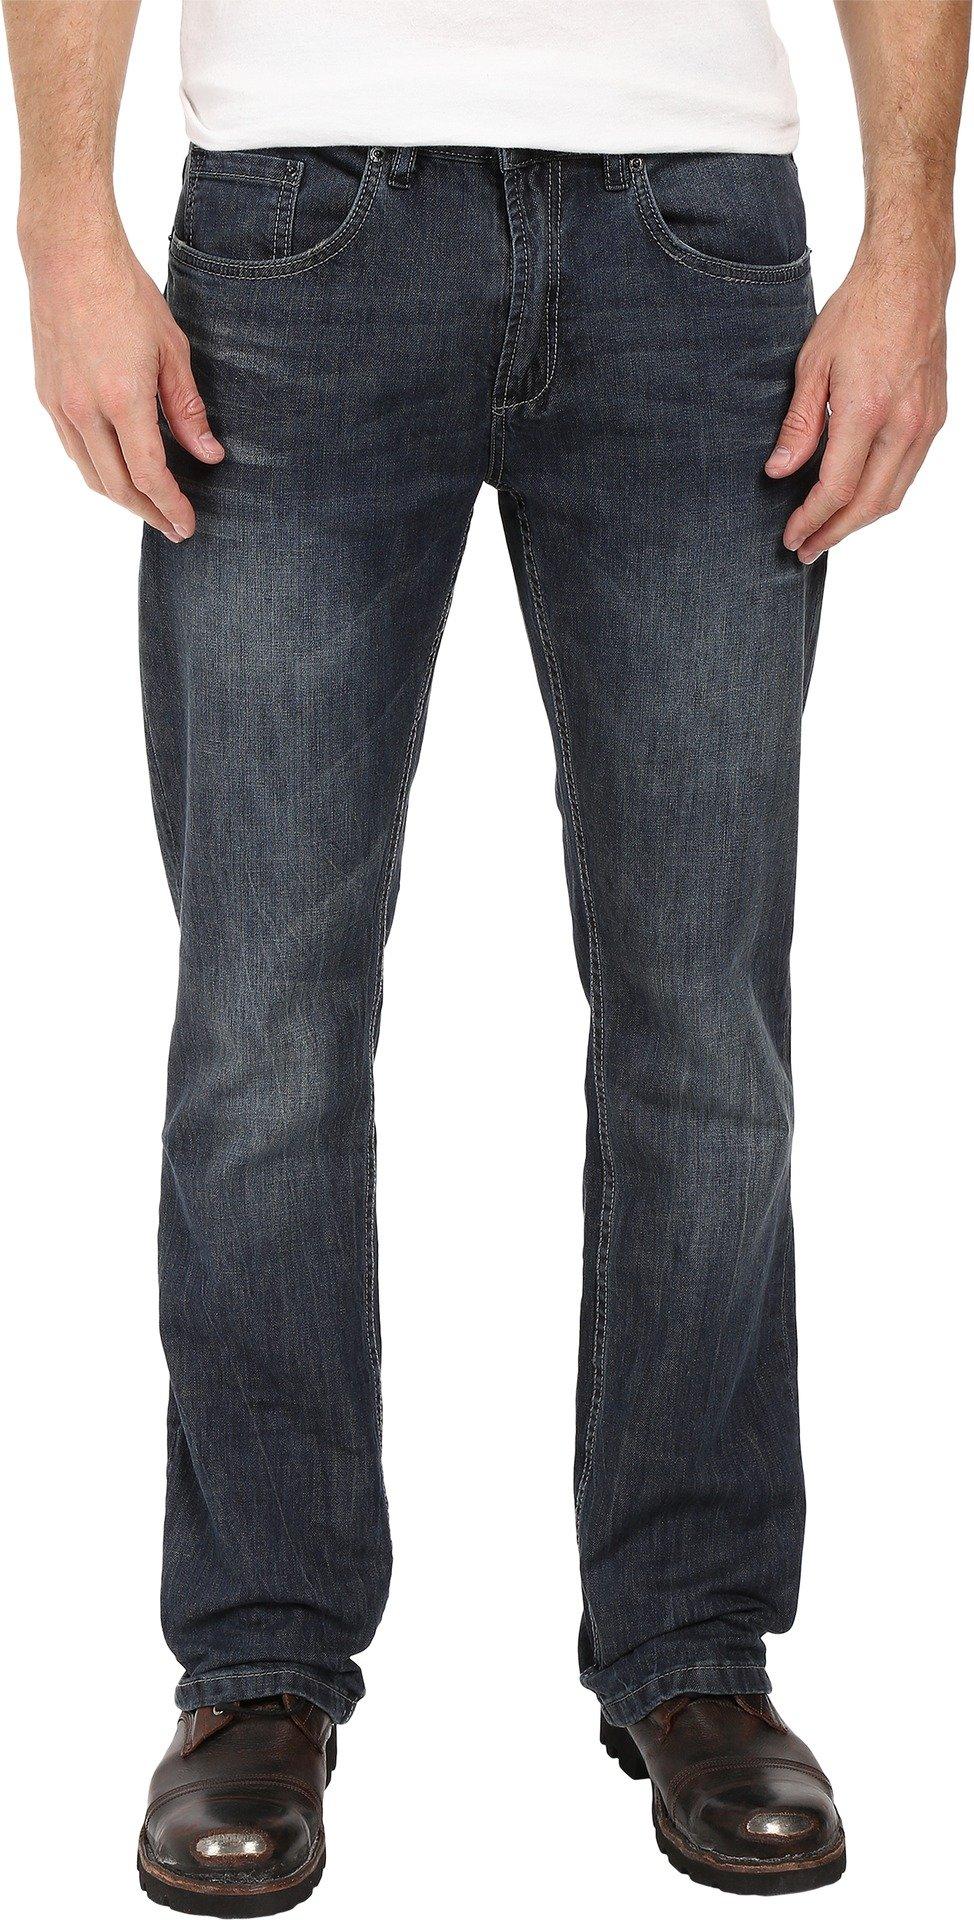 Buffalo David Bitton  Men's King Slim Boot Cut in Sandblasted/Vintage Sandblasted/Vintage Jeans